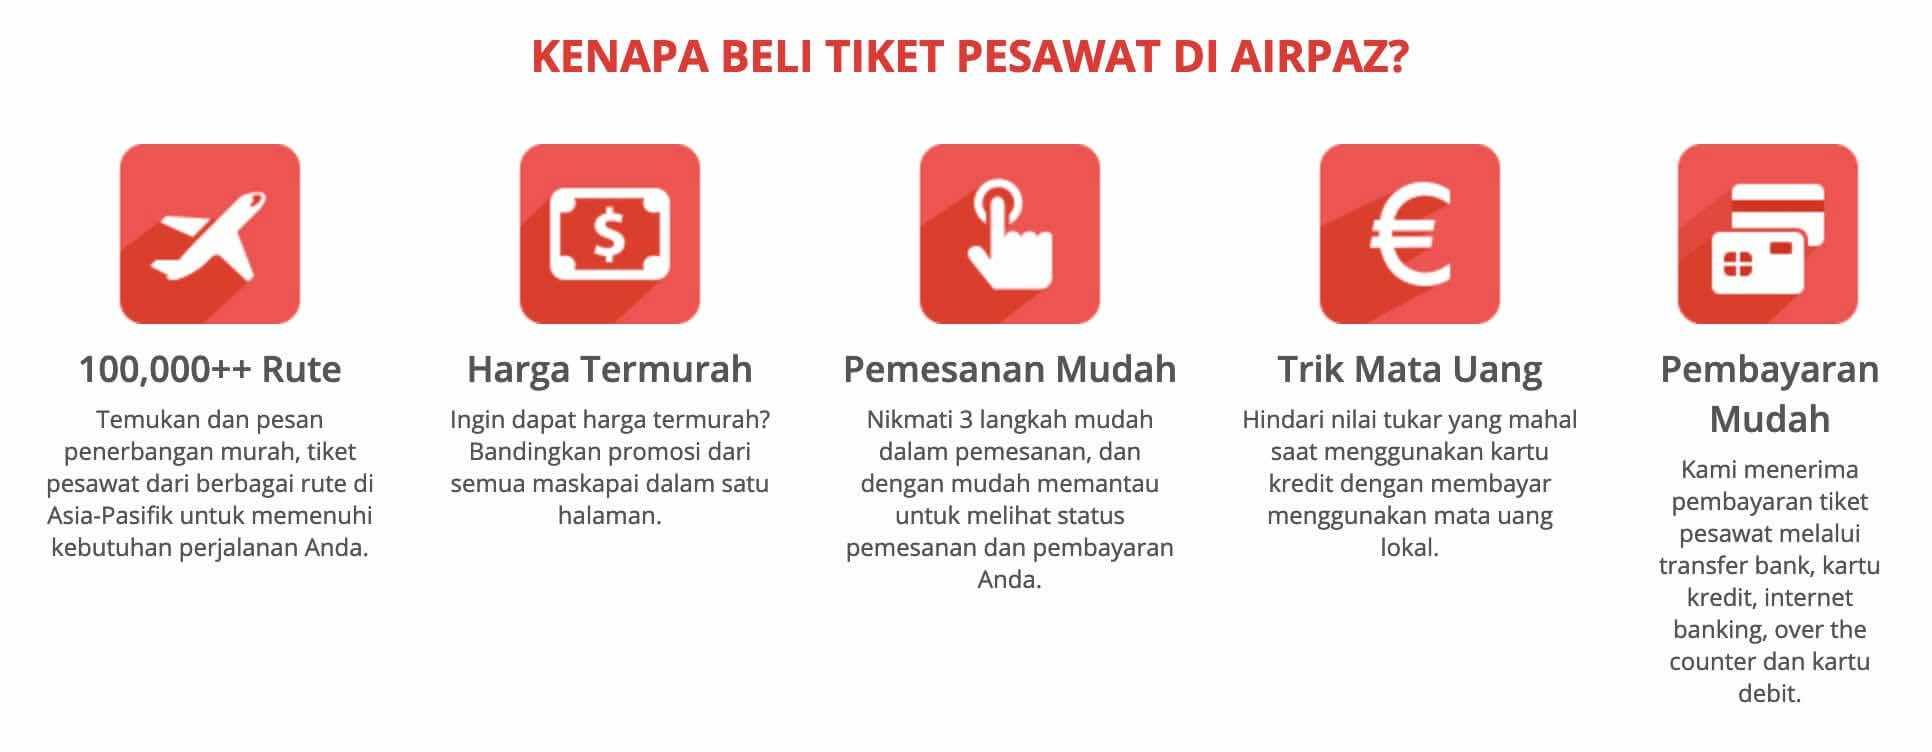 Cara Memesan Tiket Penerbangan di Airpaz